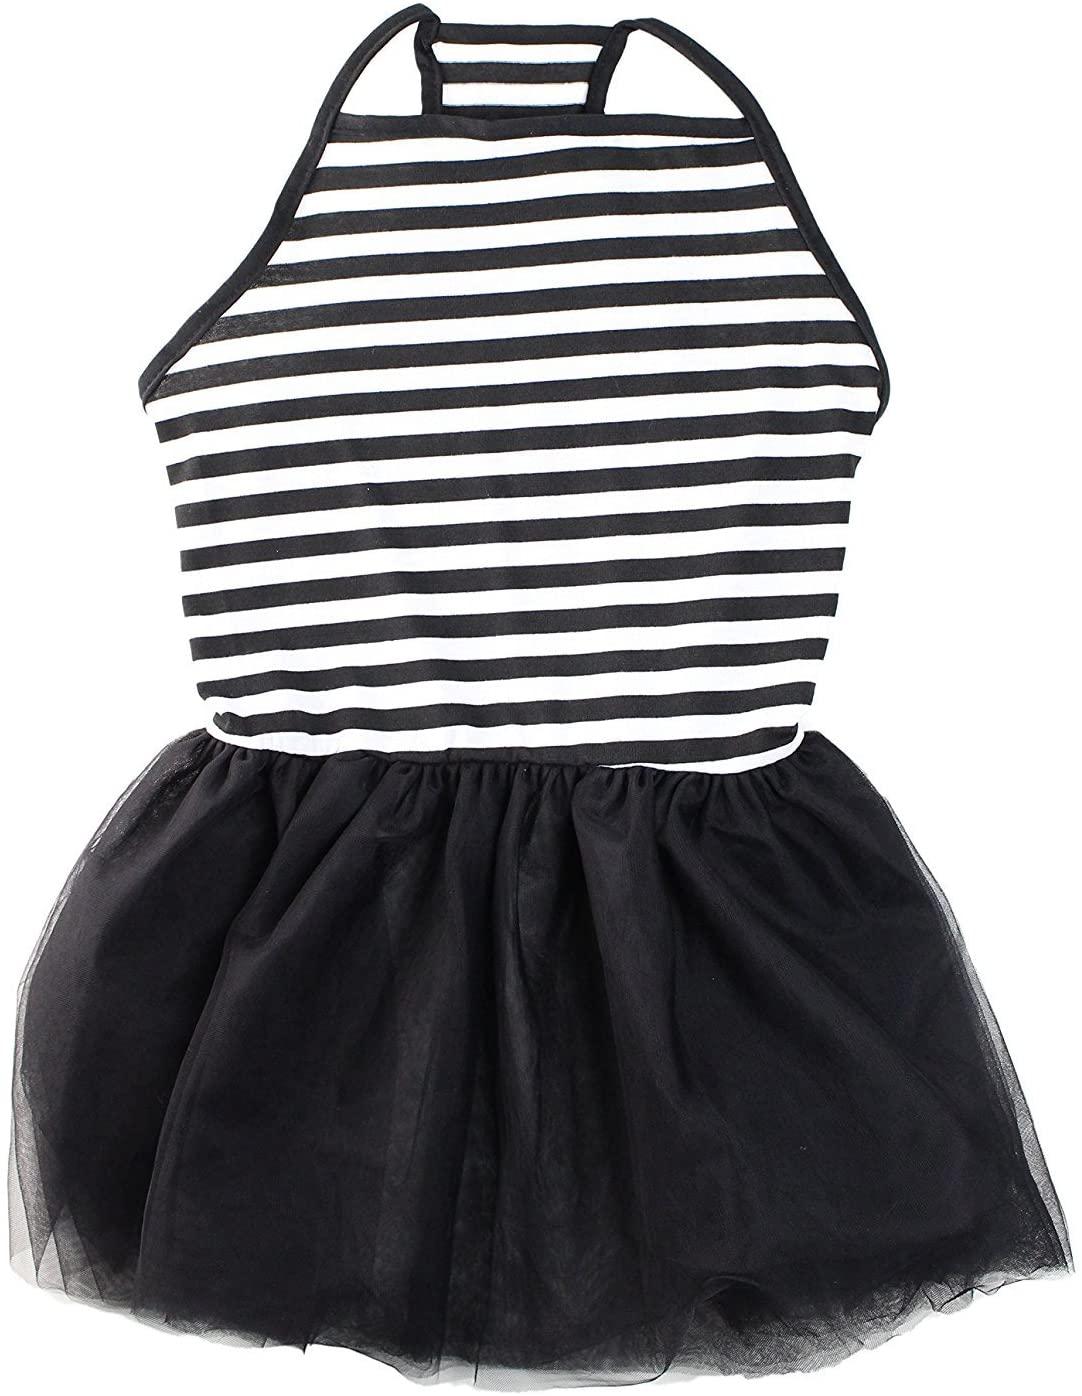 Midlee Elegant Black & White Stripe Tutu Large Dog Dress